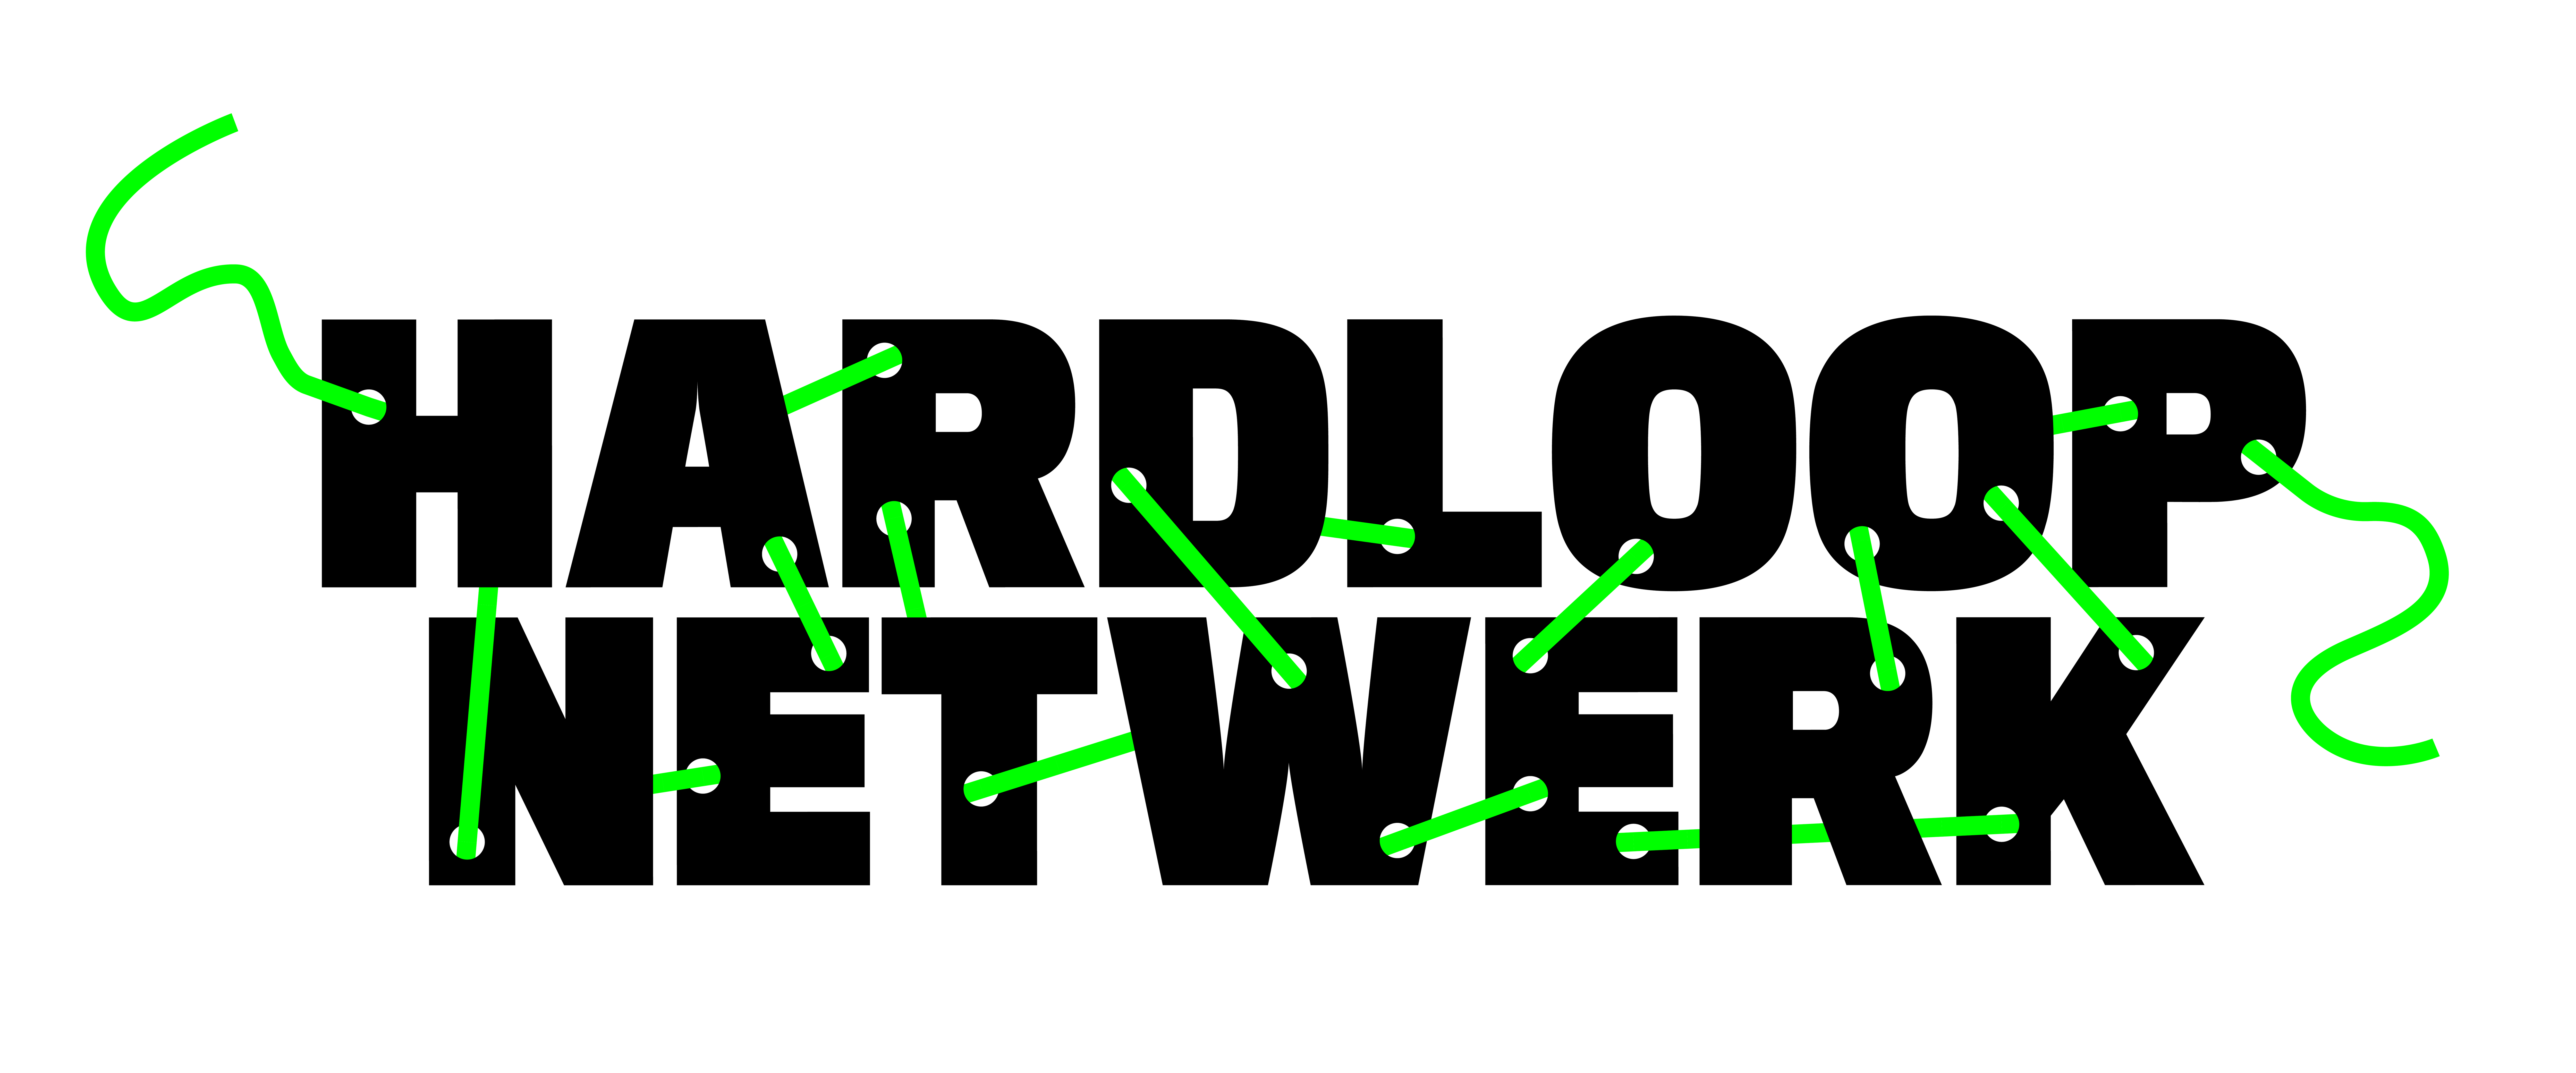 Hardloopnetwerk